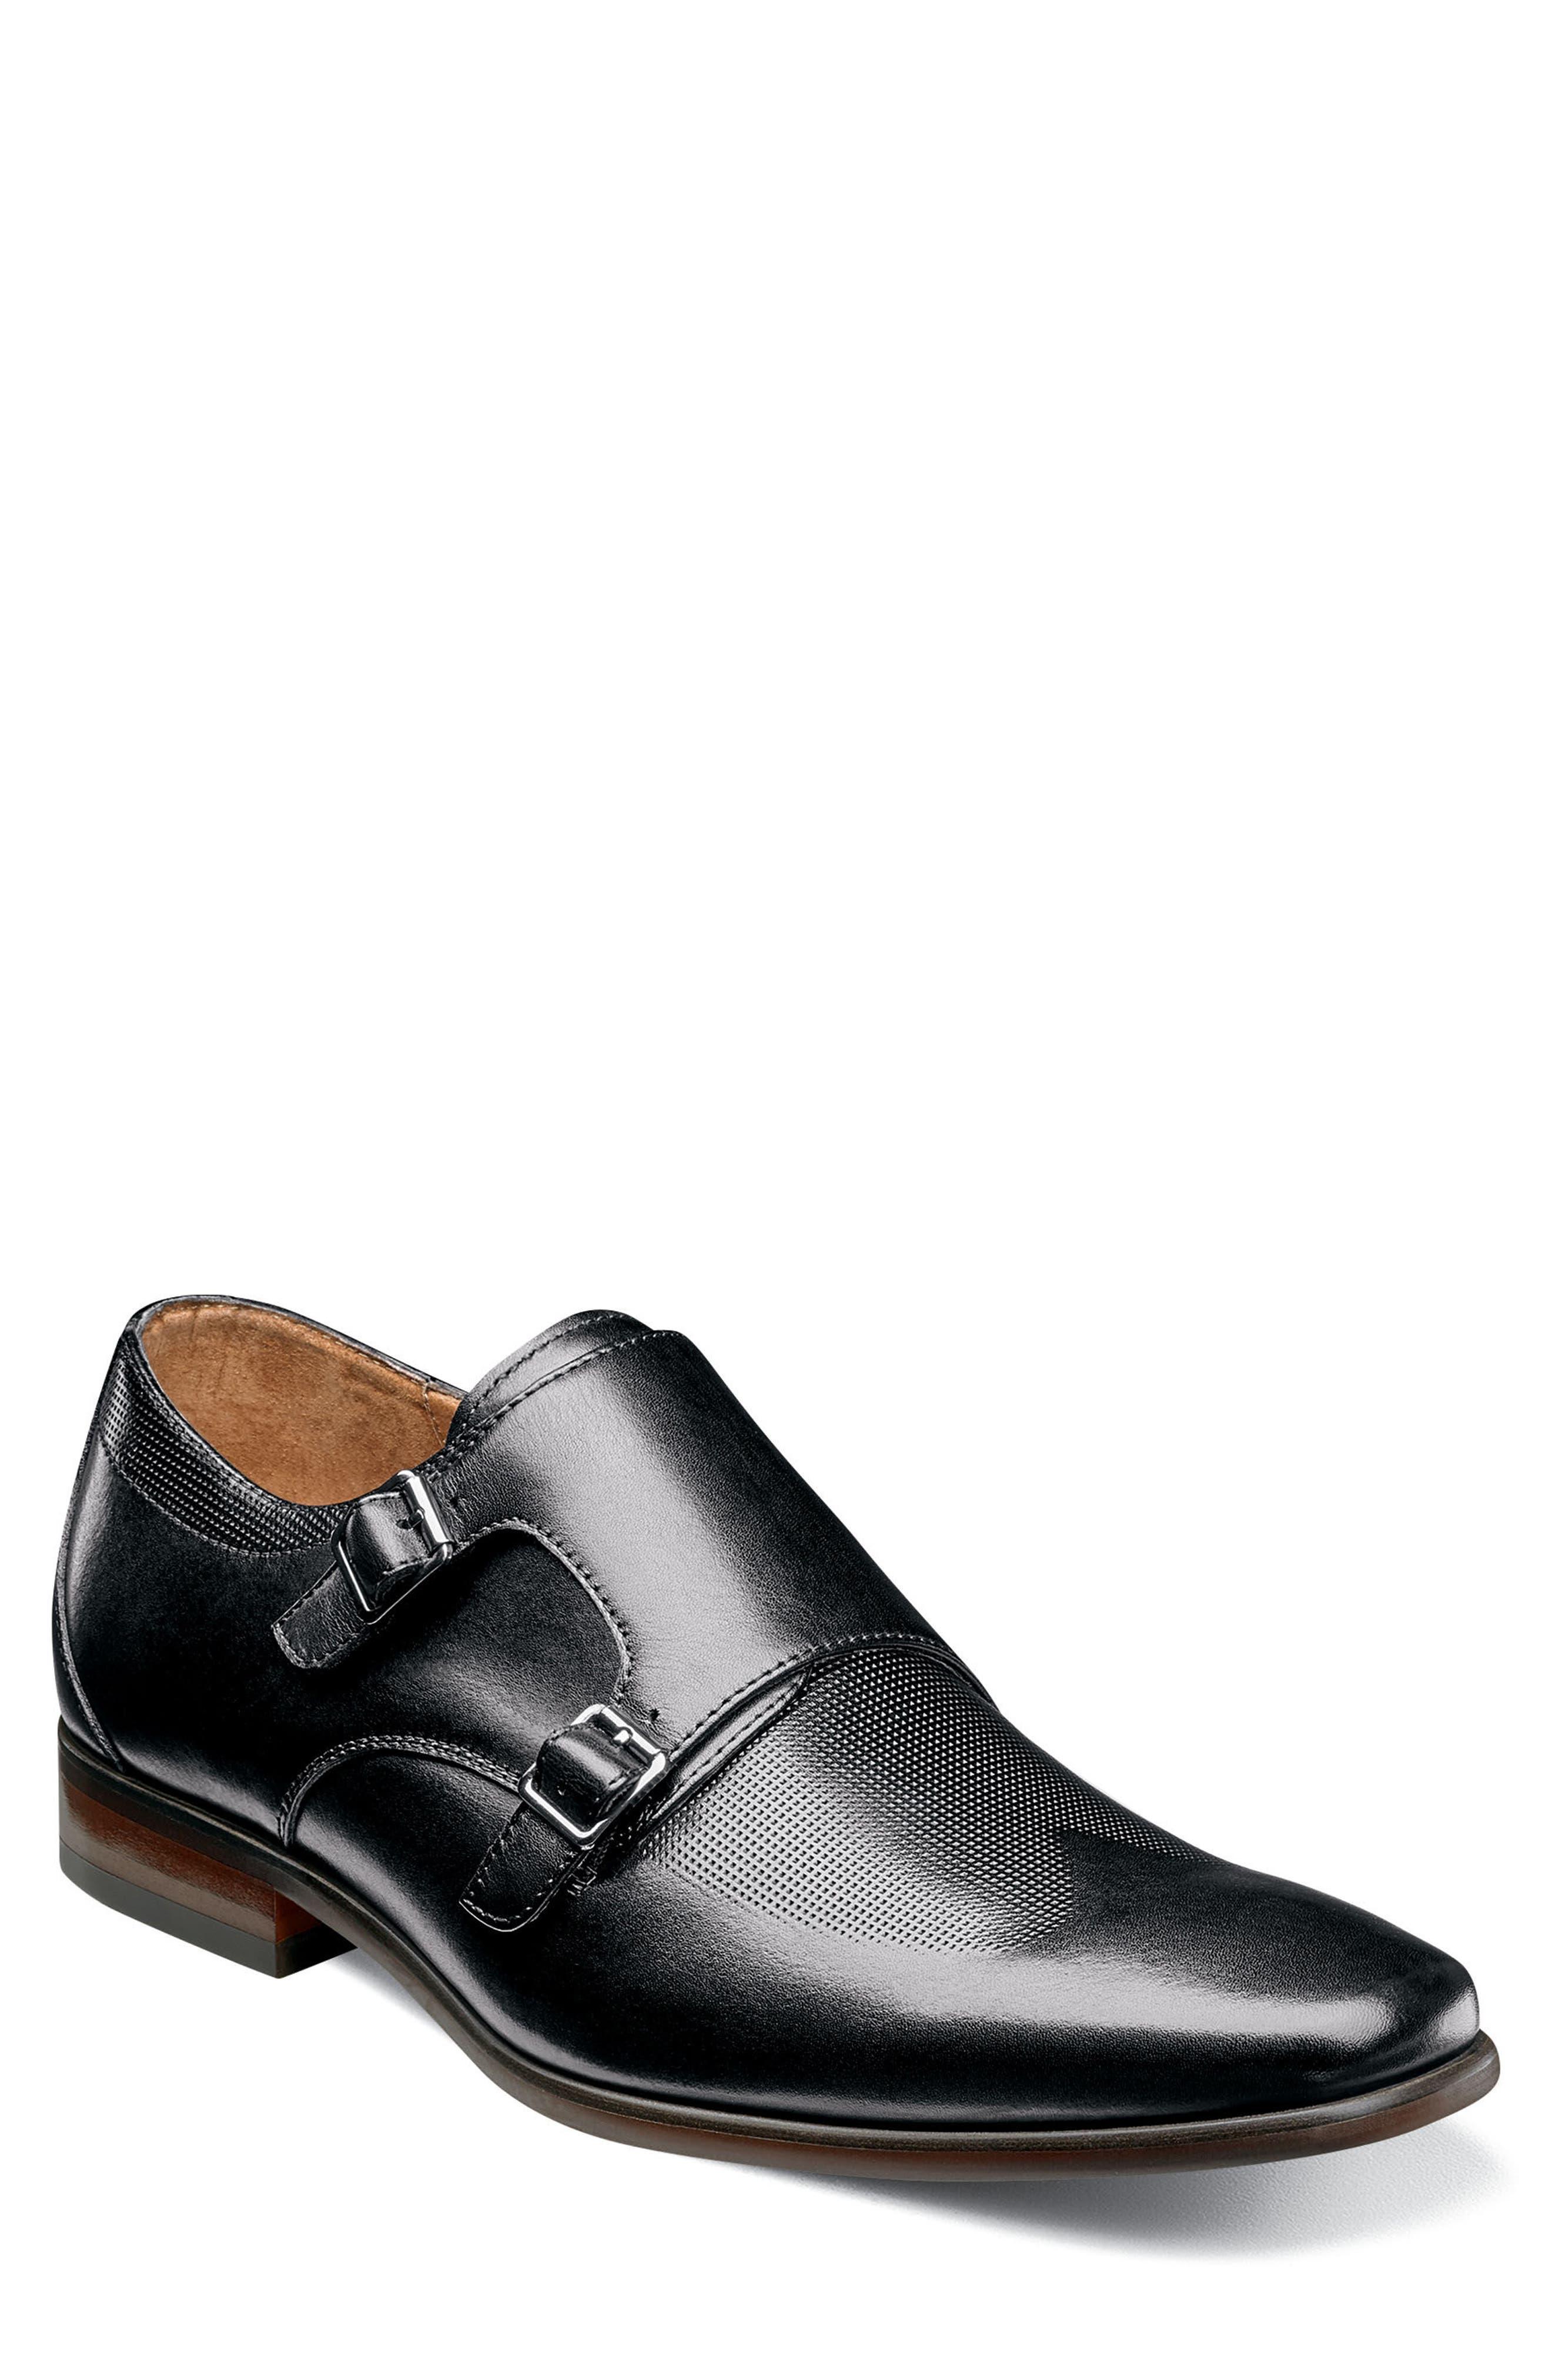 FLORSHEIM, Postino Textured Double Strap Monk Shoe, Main thumbnail 1, color, BLACK LEATHER